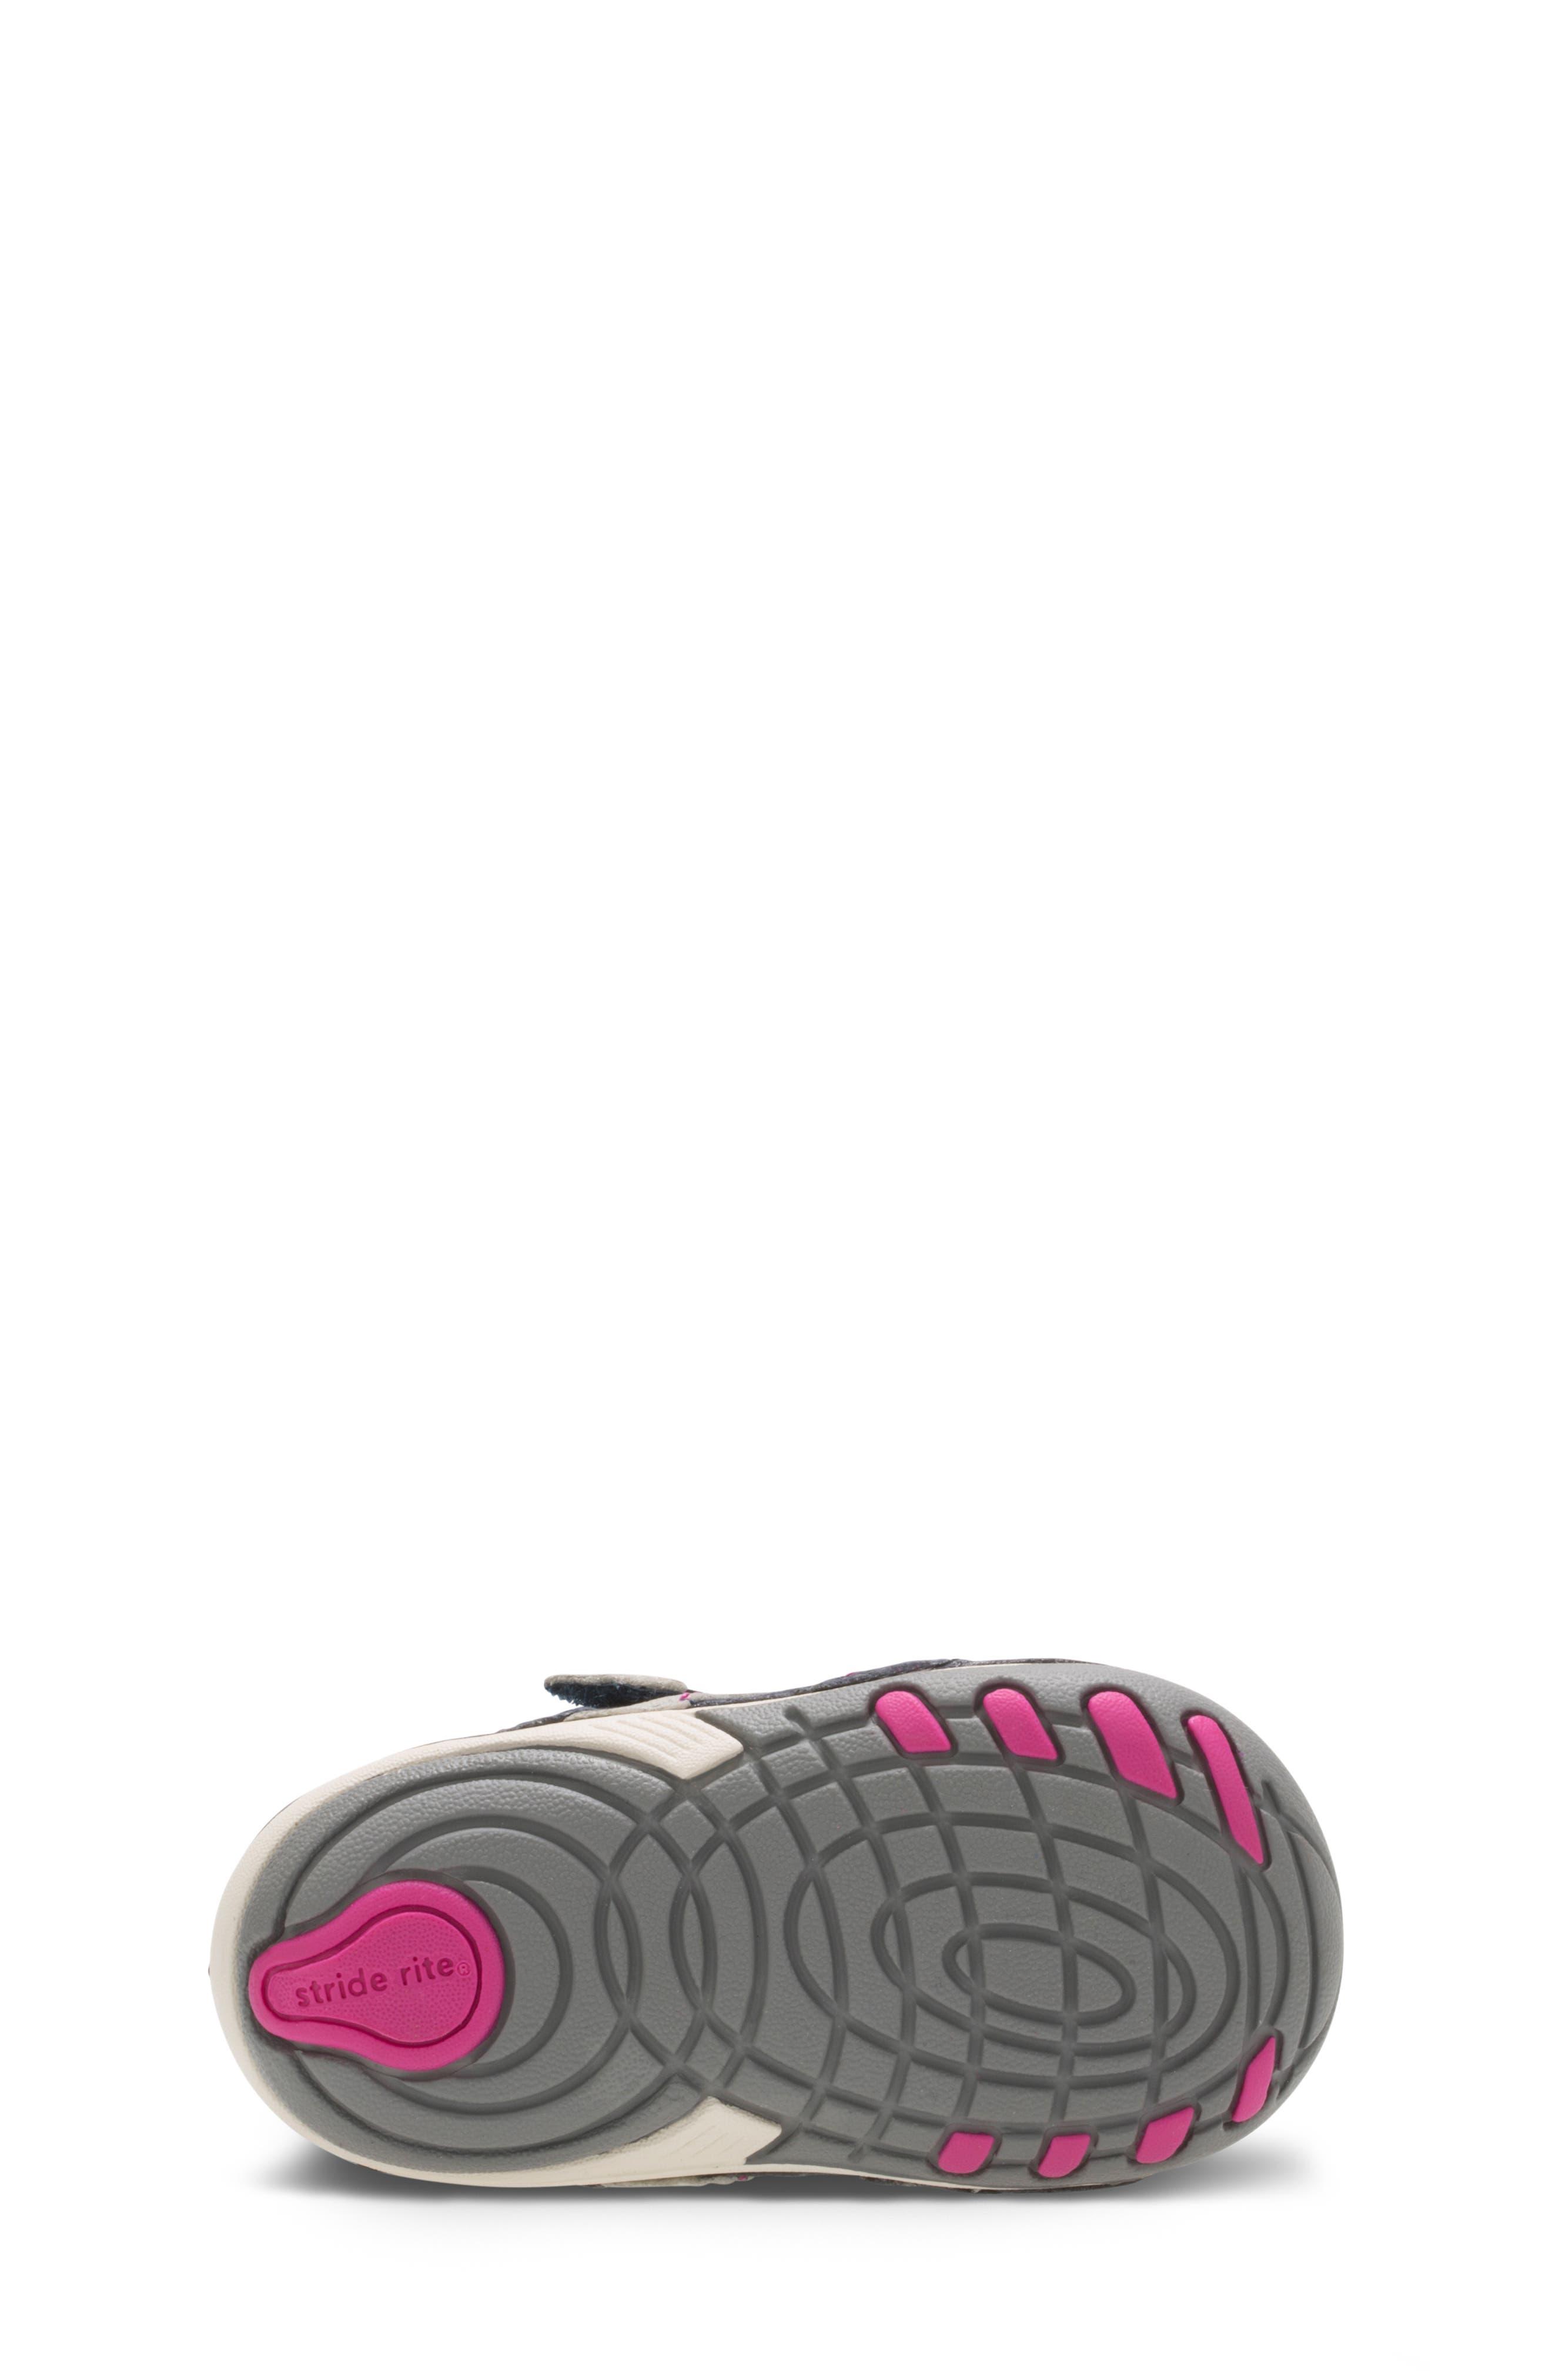 'Artie' Sneaker,                             Alternate thumbnail 4, color,                             NAVY/ PINK